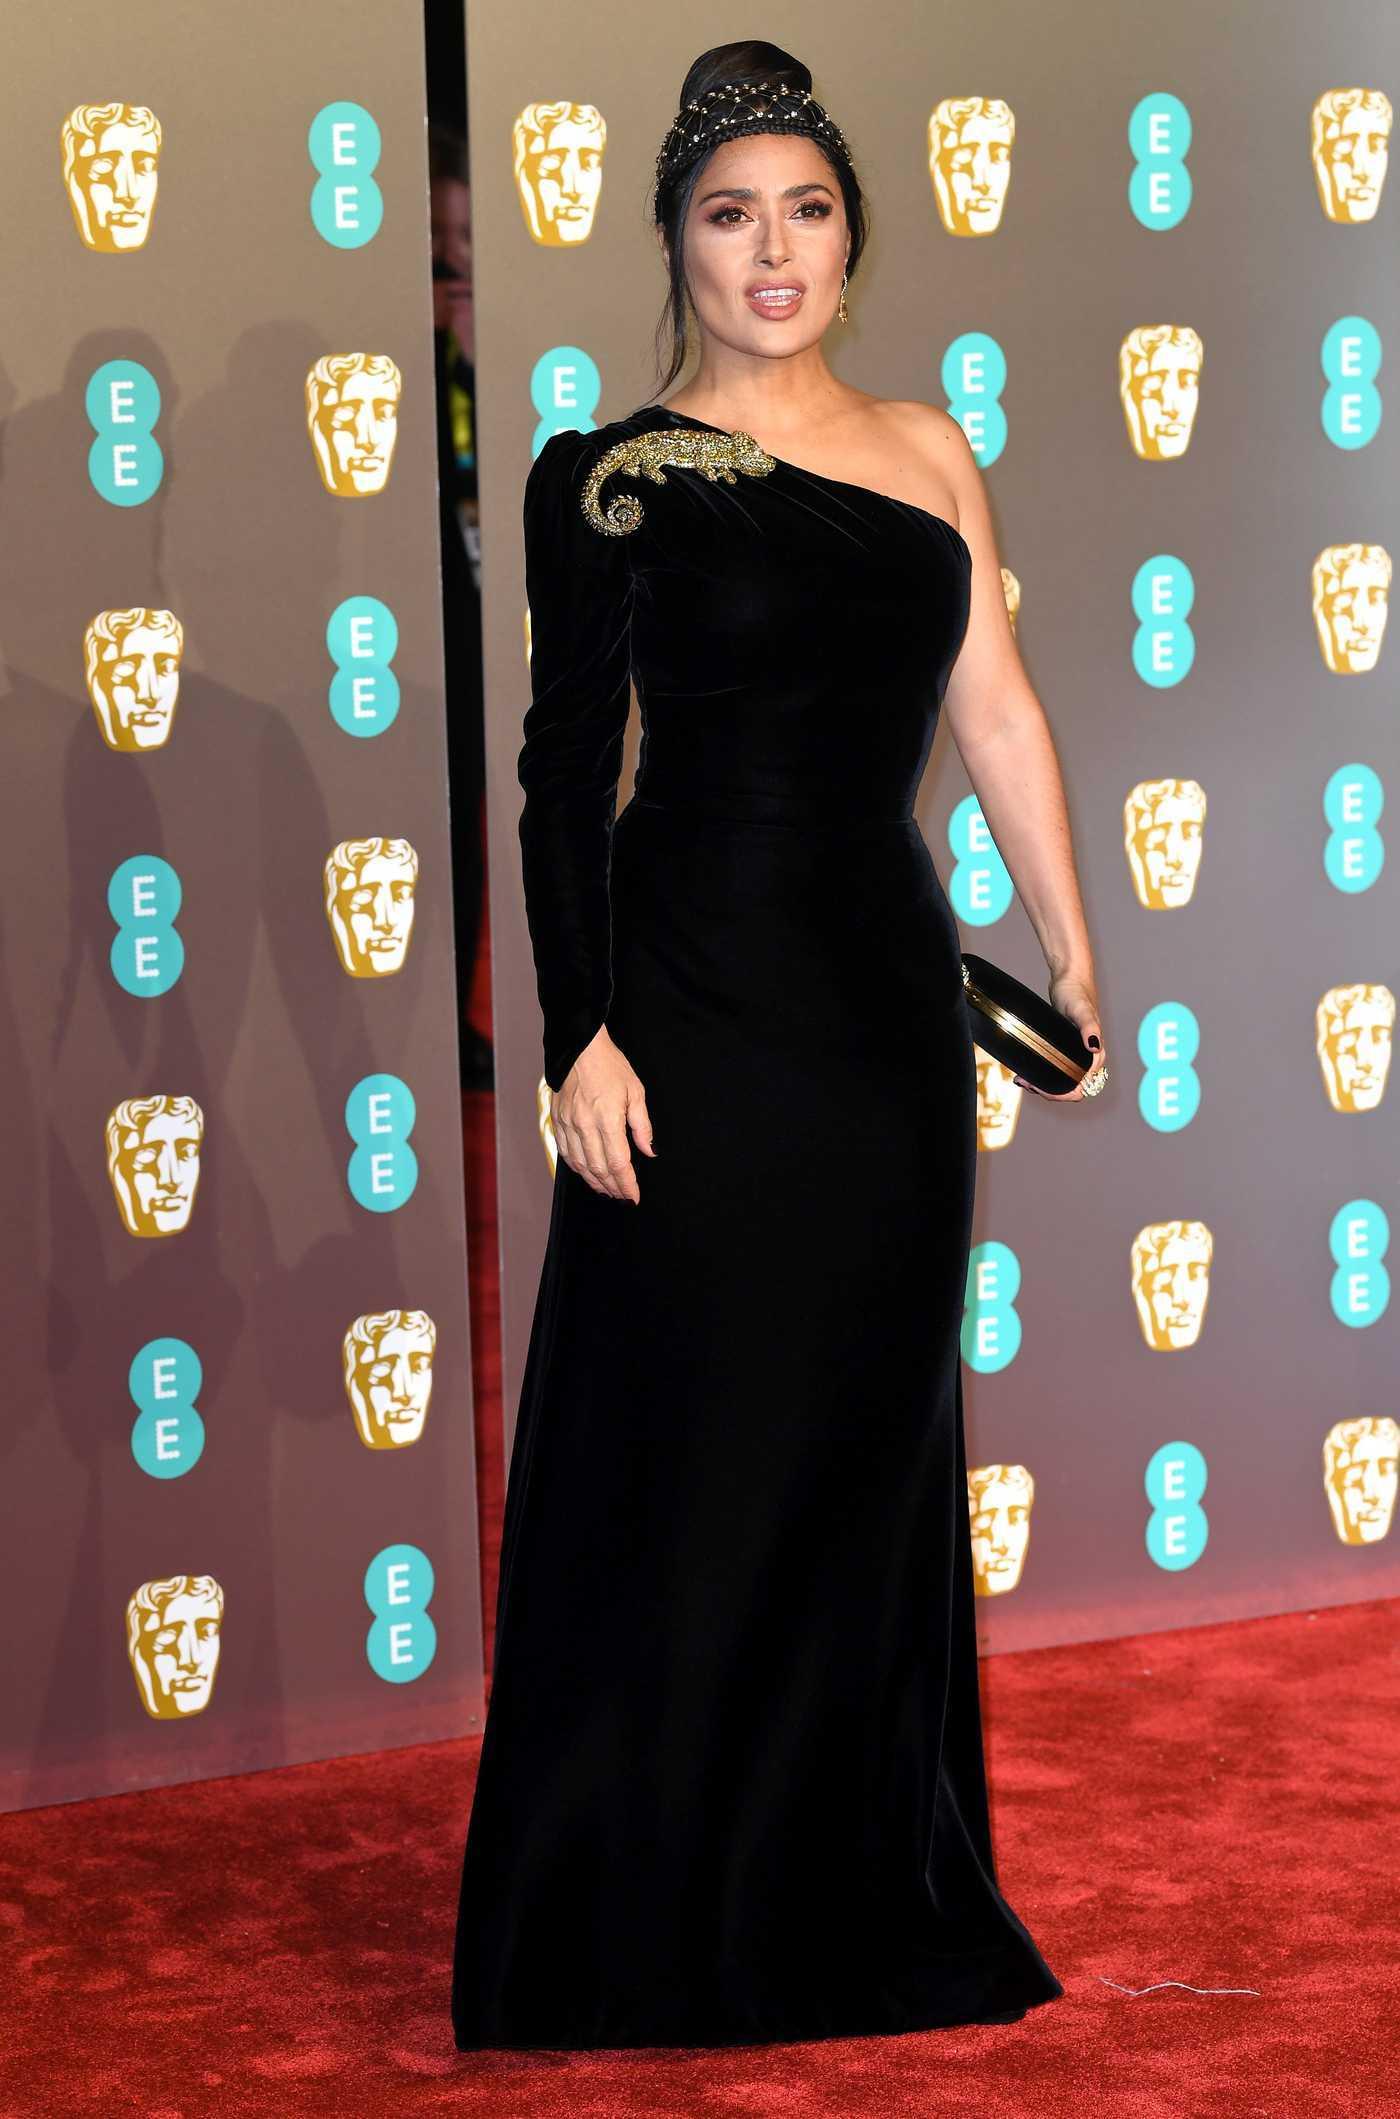 Salma Hayek Attends 2019 BAFTA Awards in London 02/10/2019